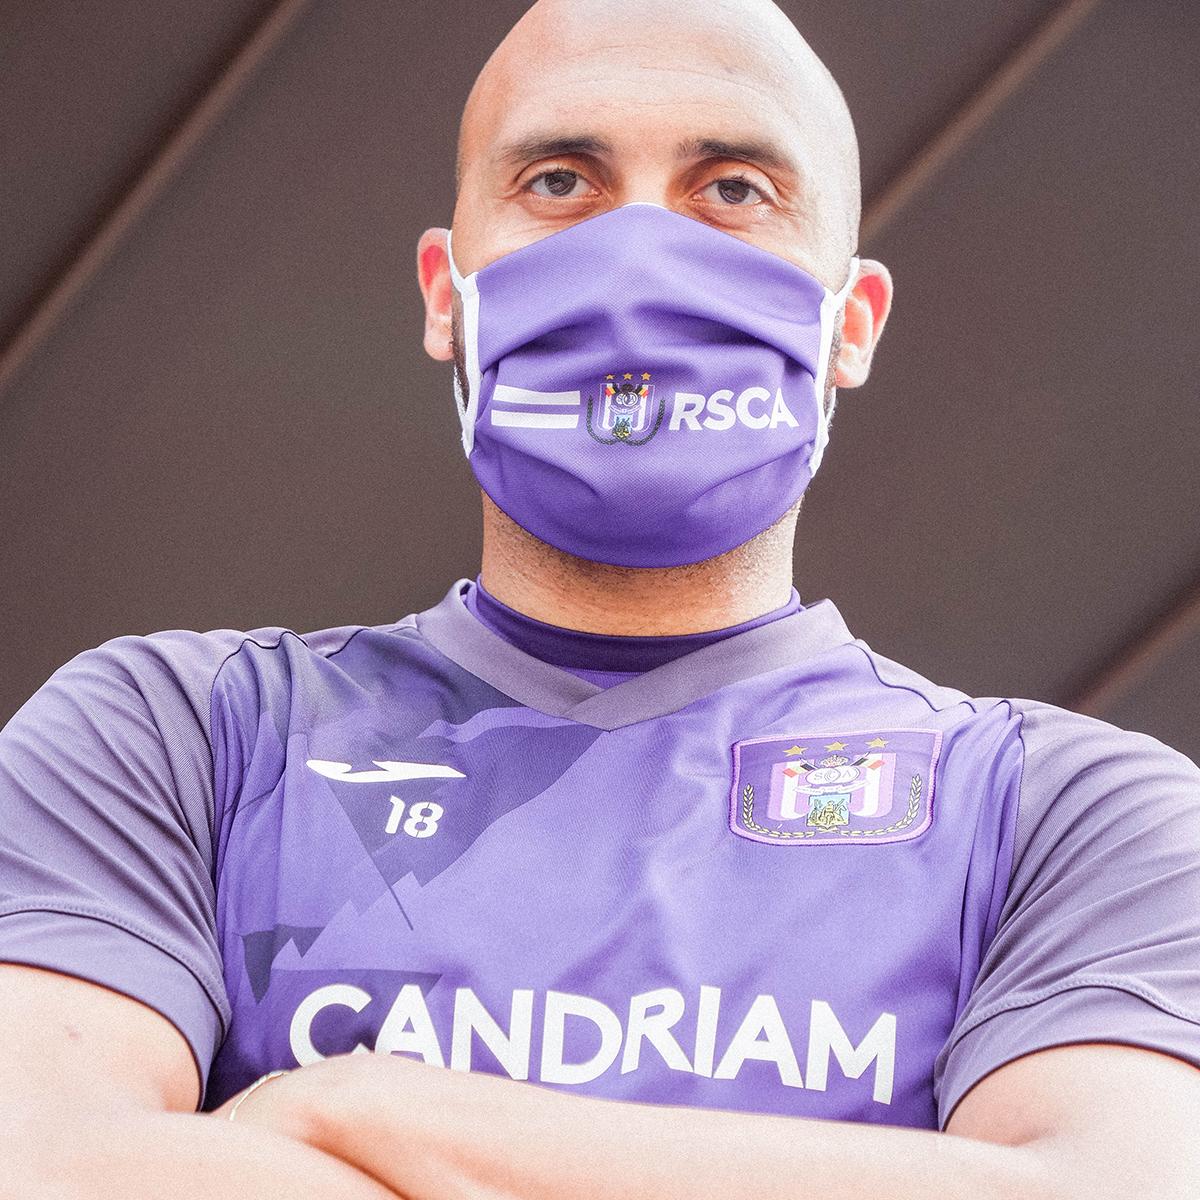 RSCA Face Masks